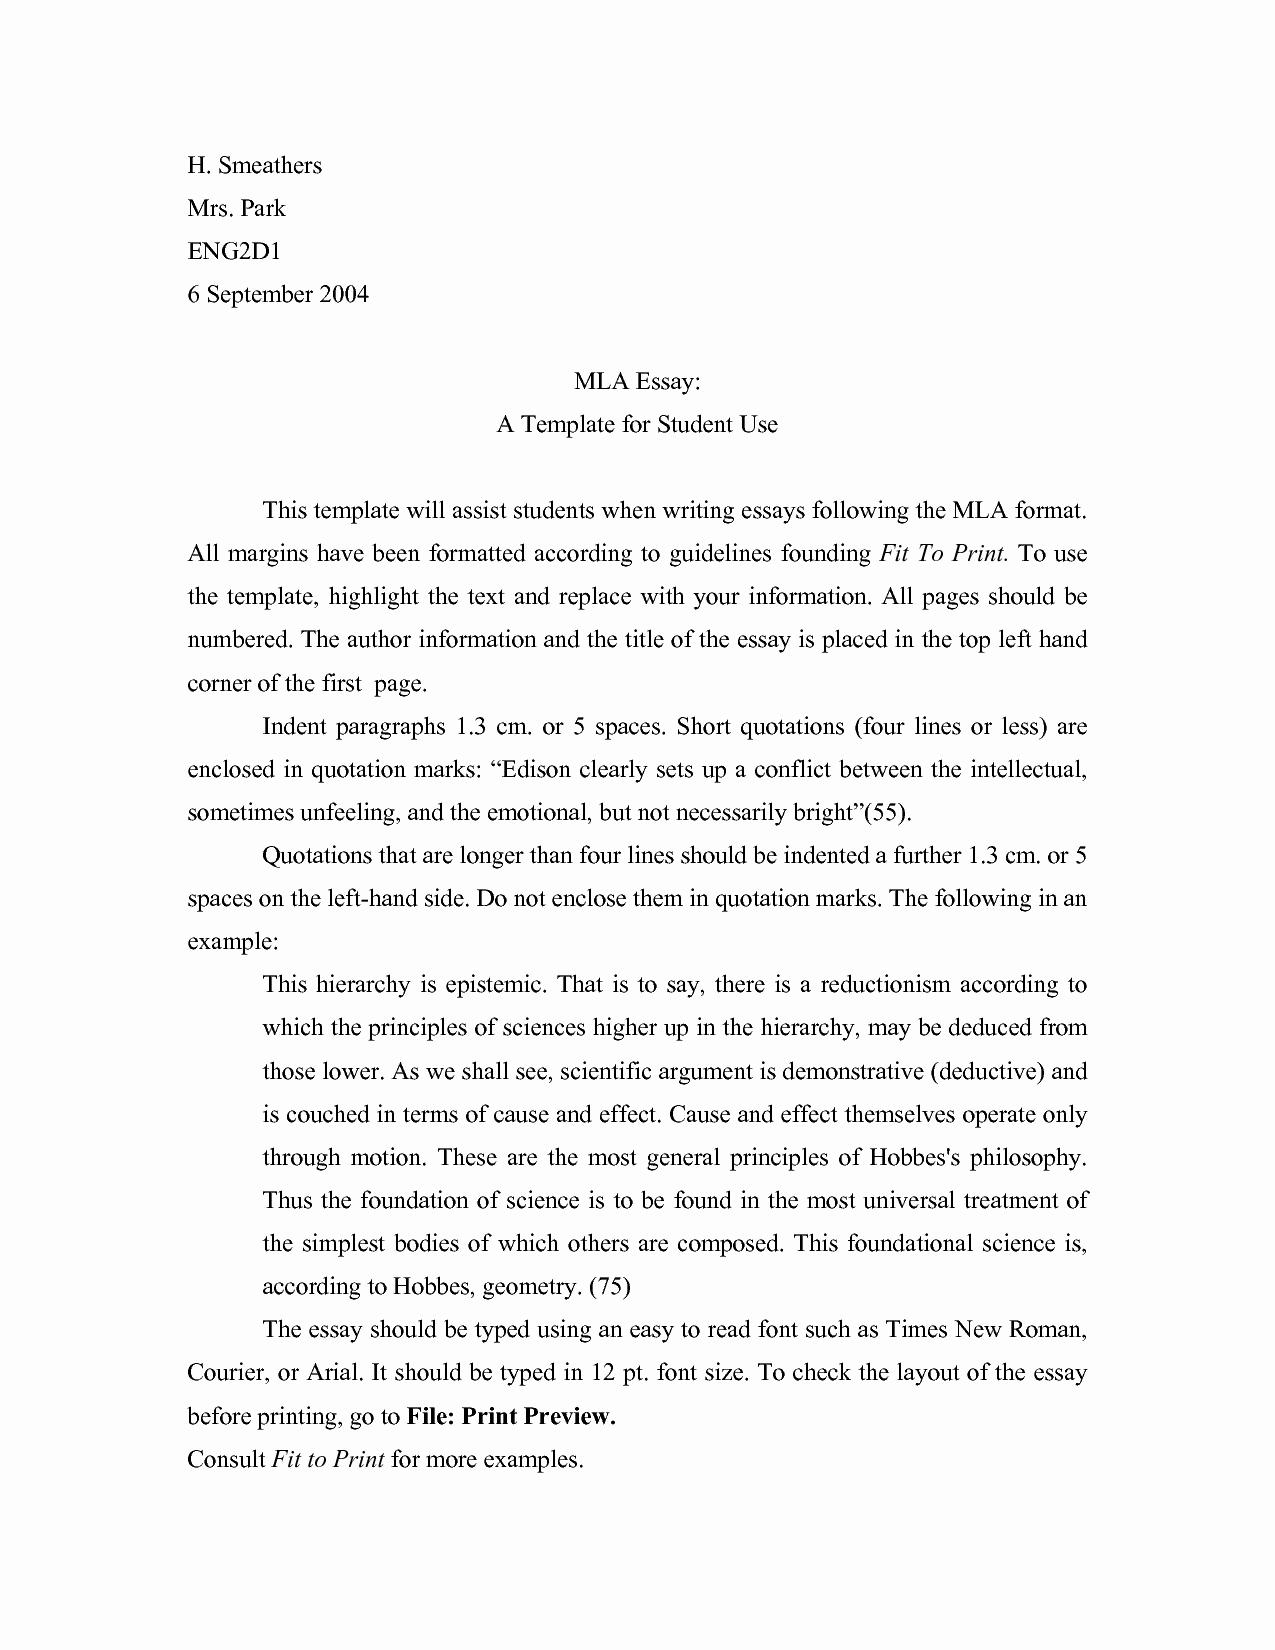 Mla format Of A Paper Elegant Mla format Template